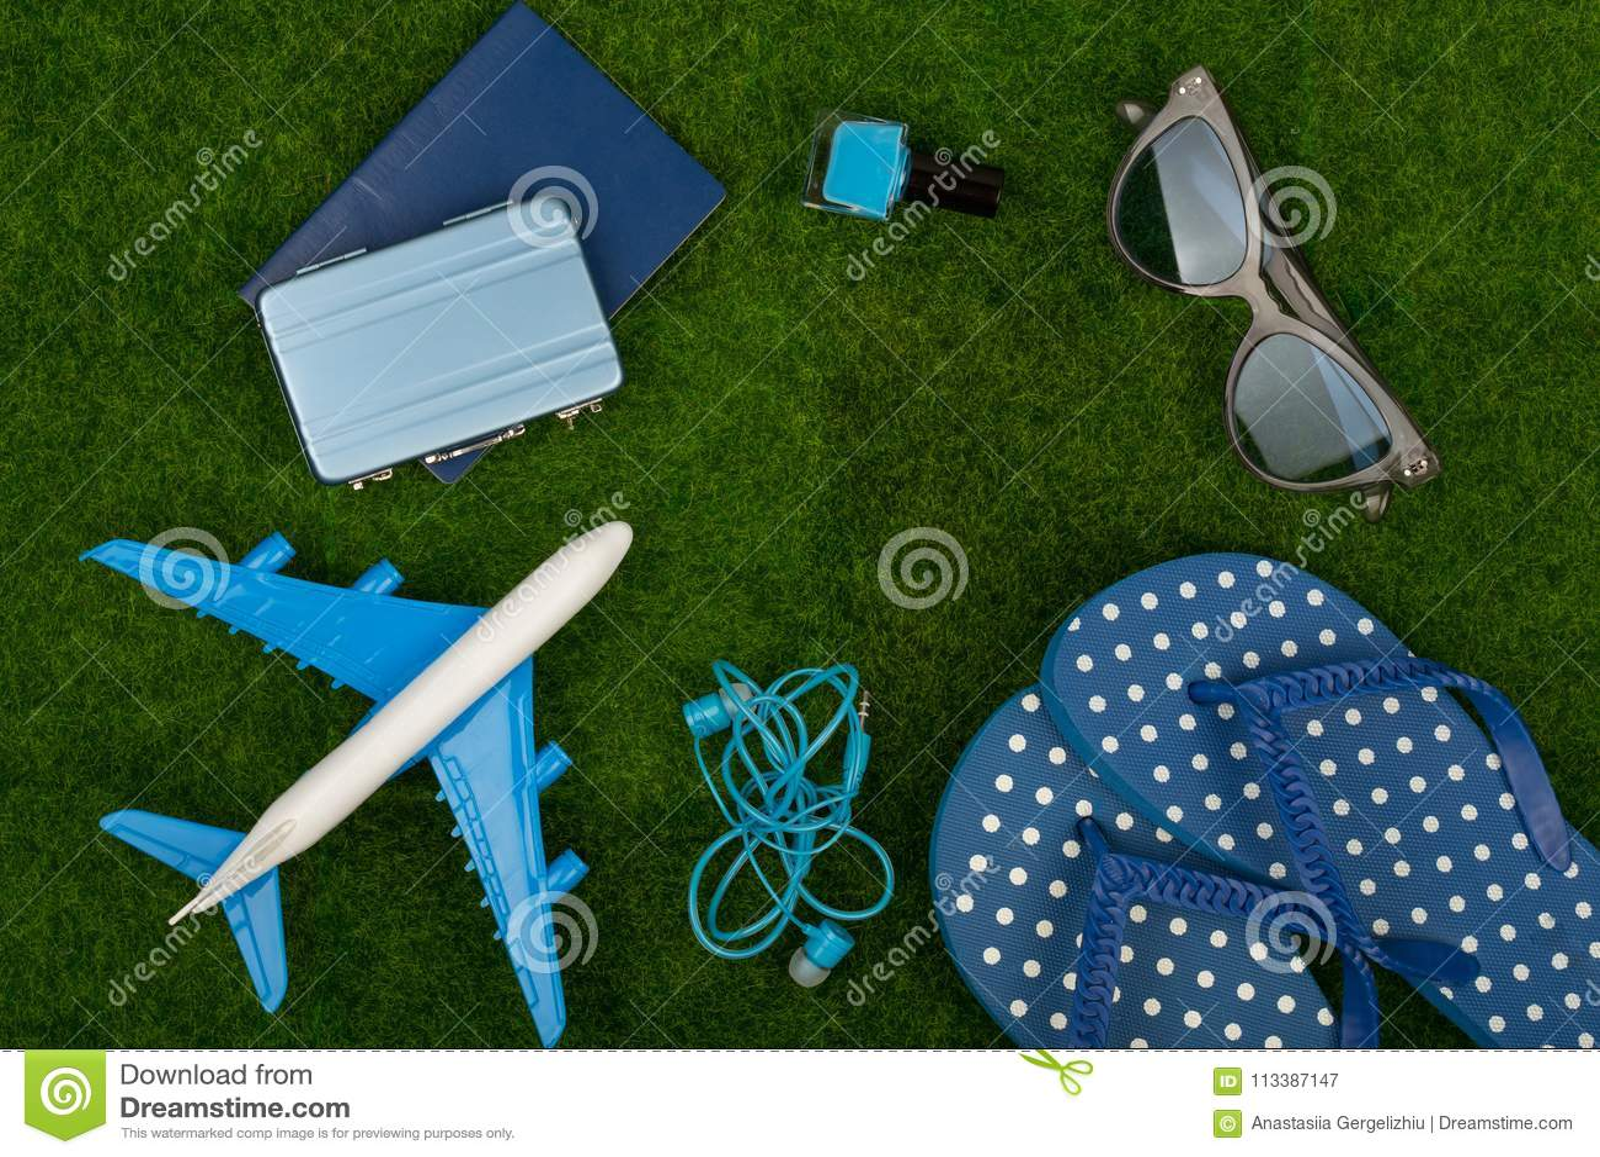 Bonito Arte De Uñas Avión Motivo - Ideas Para Pintar Uñas - knxc.info